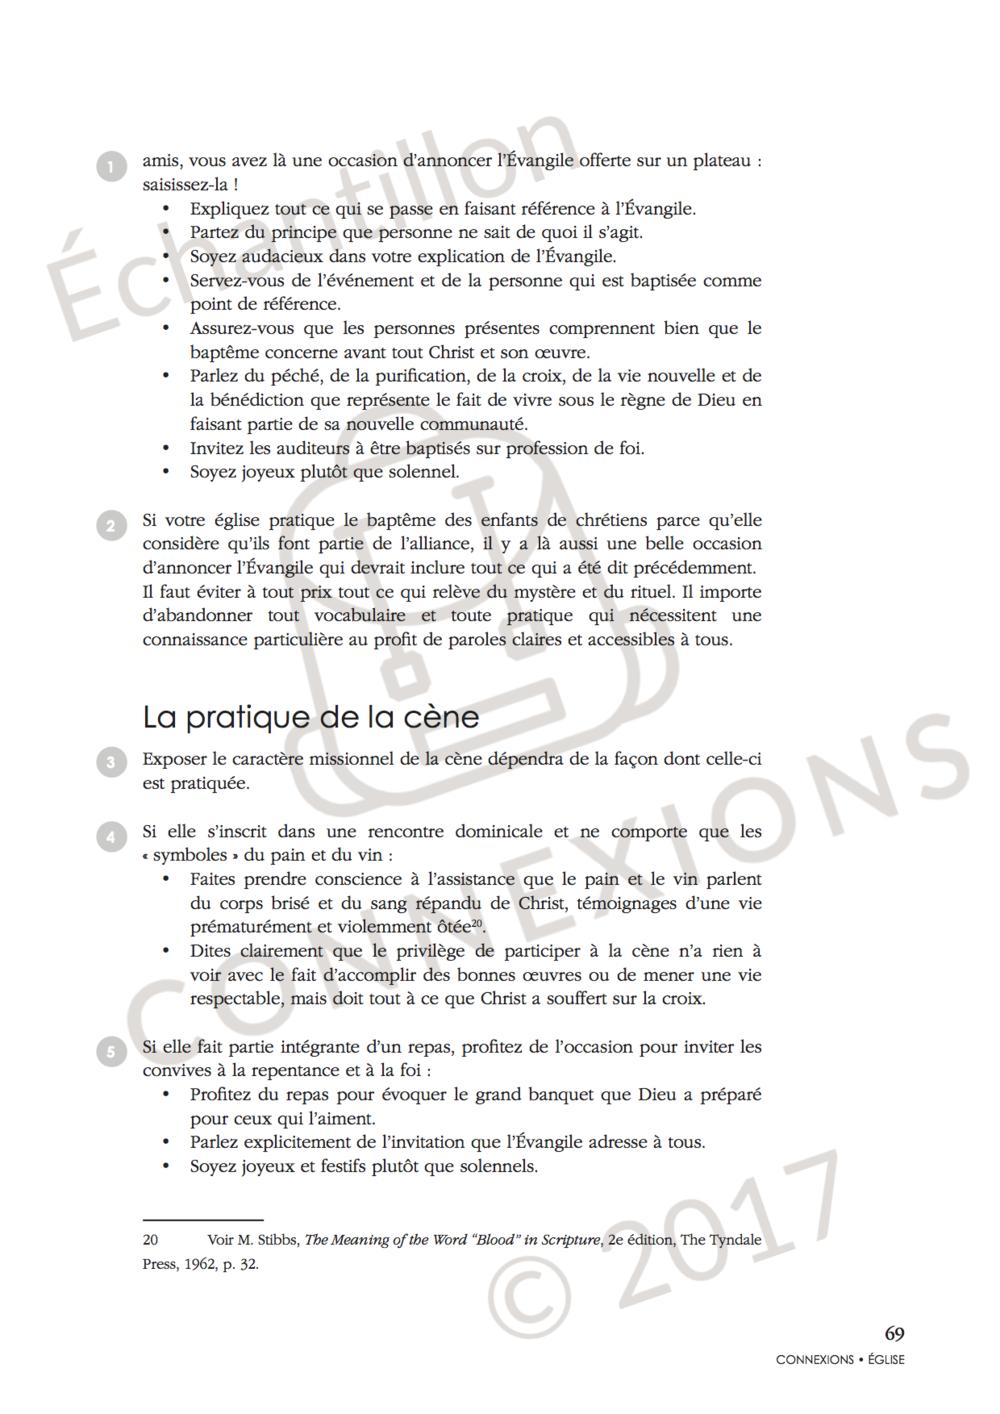 Garder le cap missionnel_sample_published.6.png